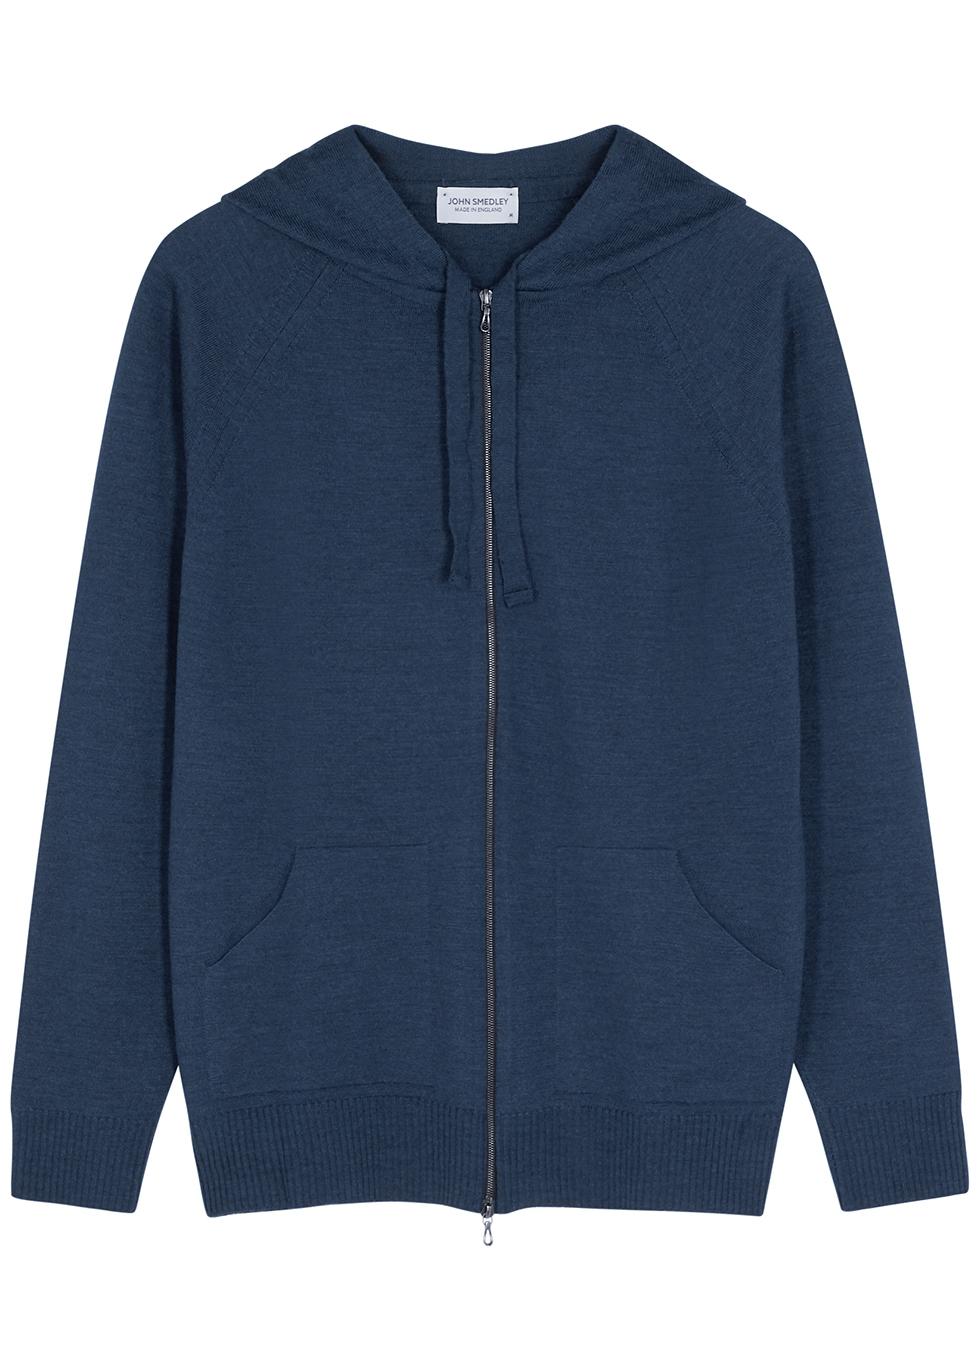 Reservoir navy hooded merino wool jumper